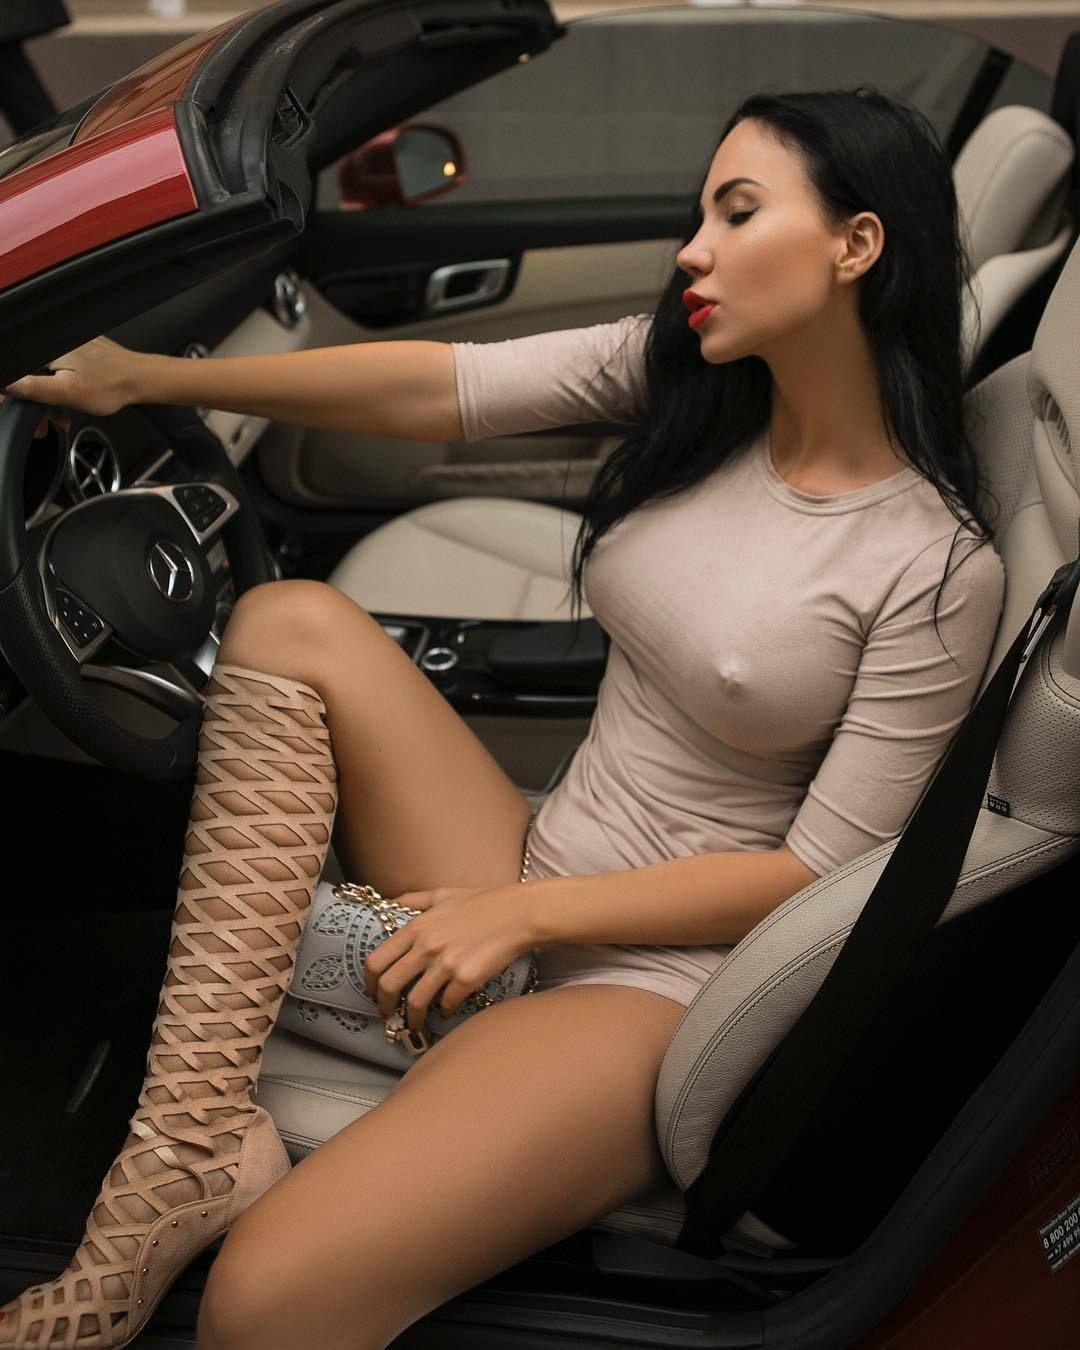 Haley Kalil nude photos 2019